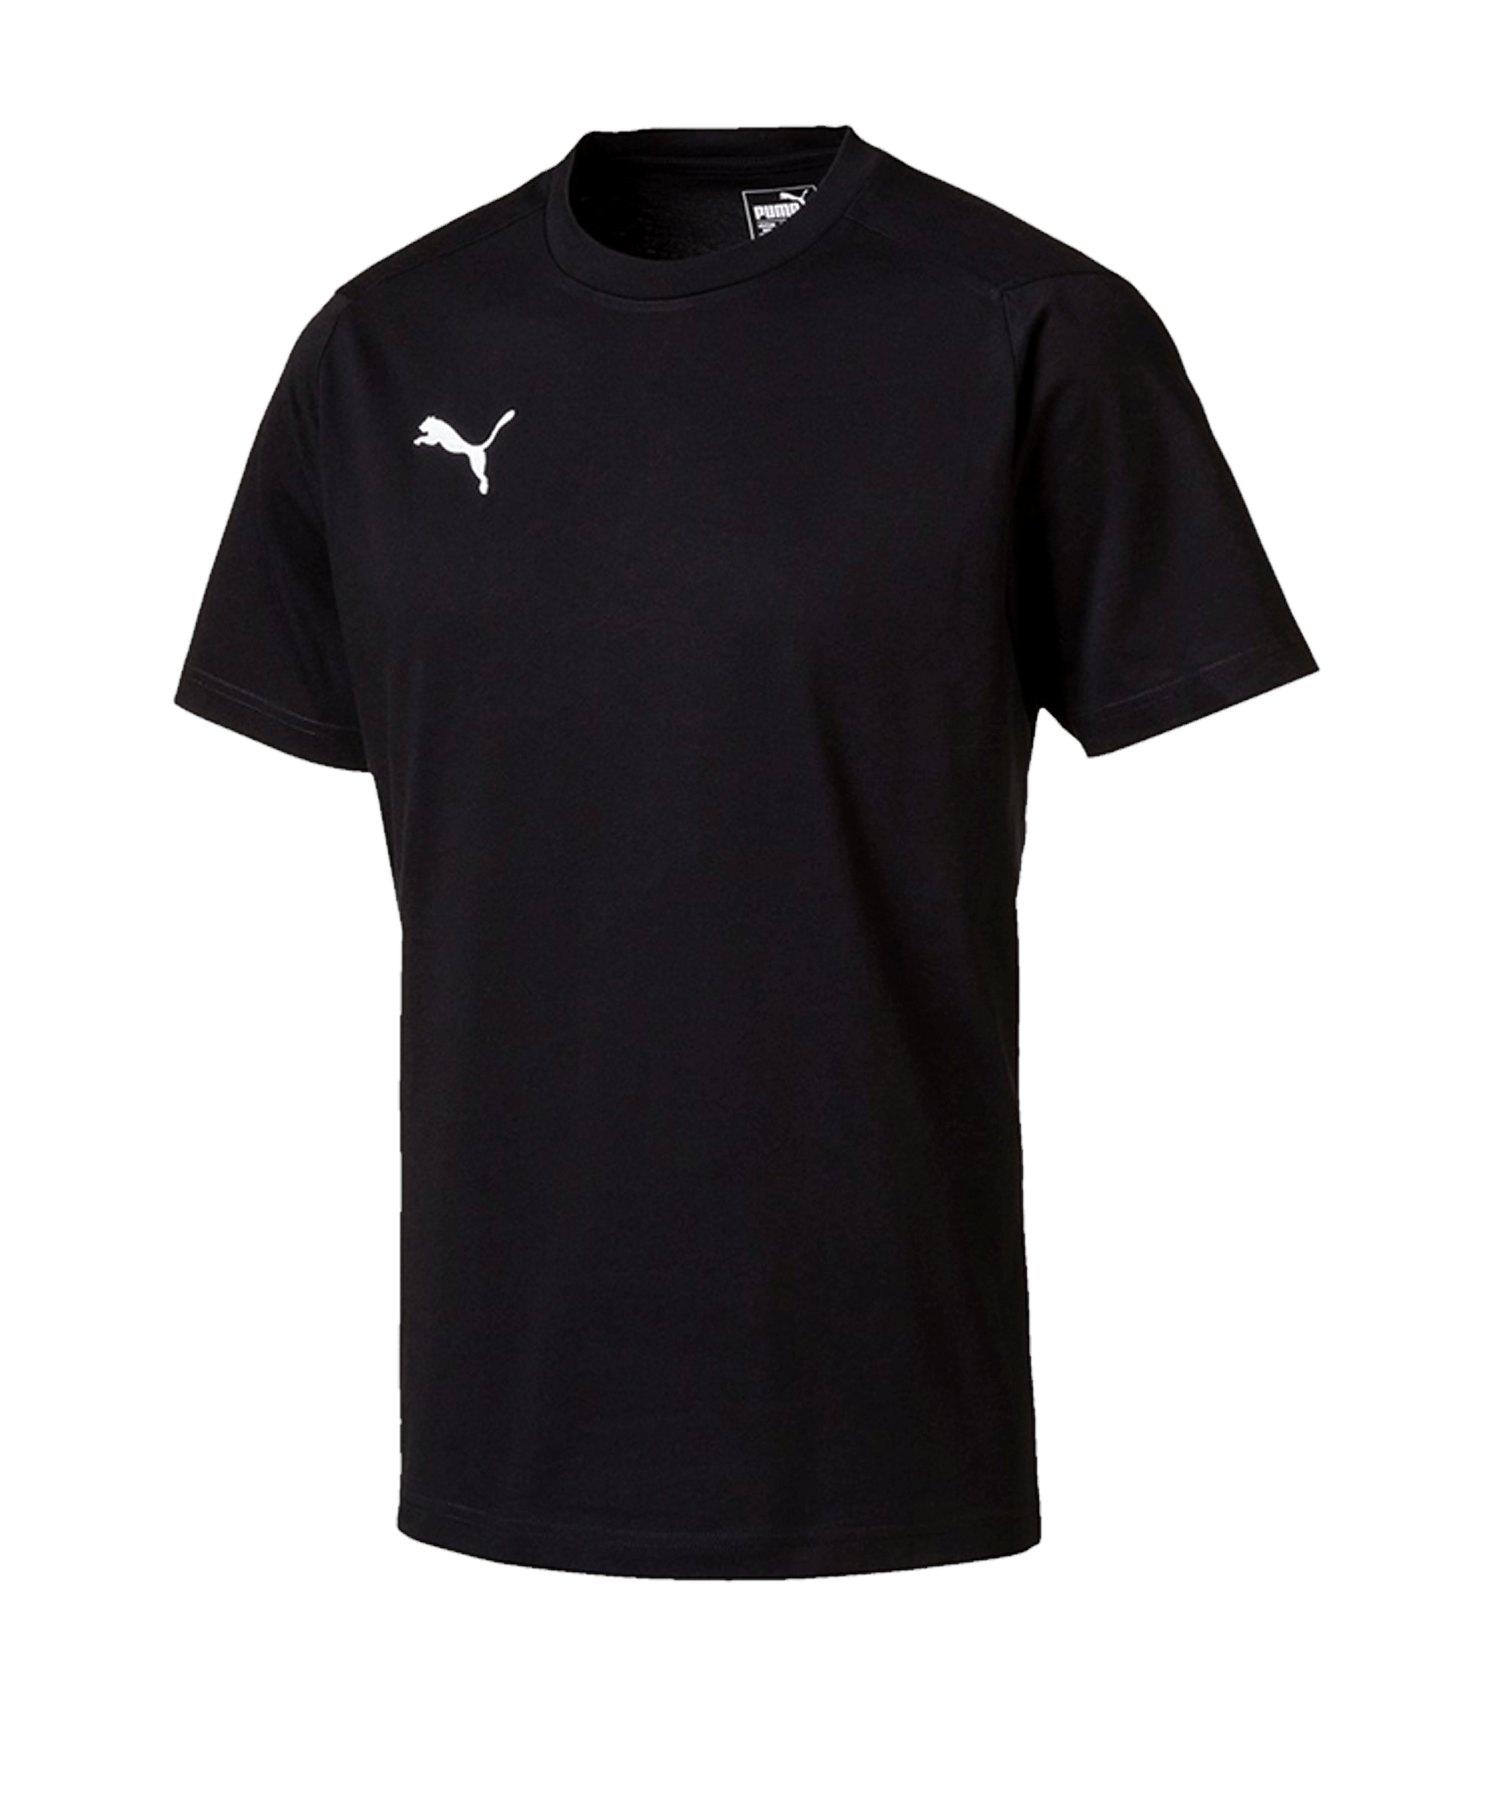 PUMA LIGA Casuals Tee T-Shirt Schwarz F03 - schwarz